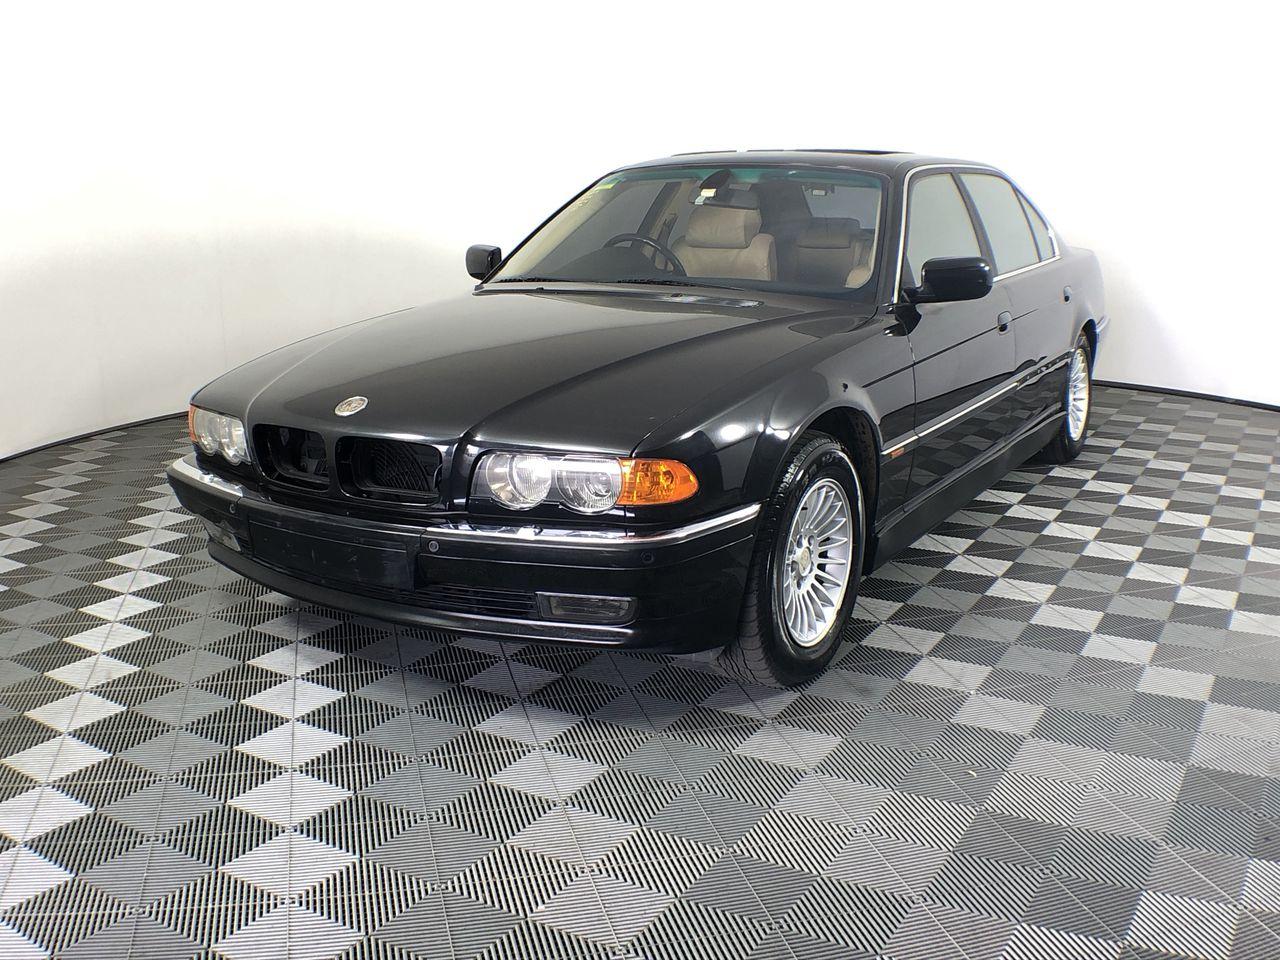 1998 BMW 740 IL Automatic Sedan